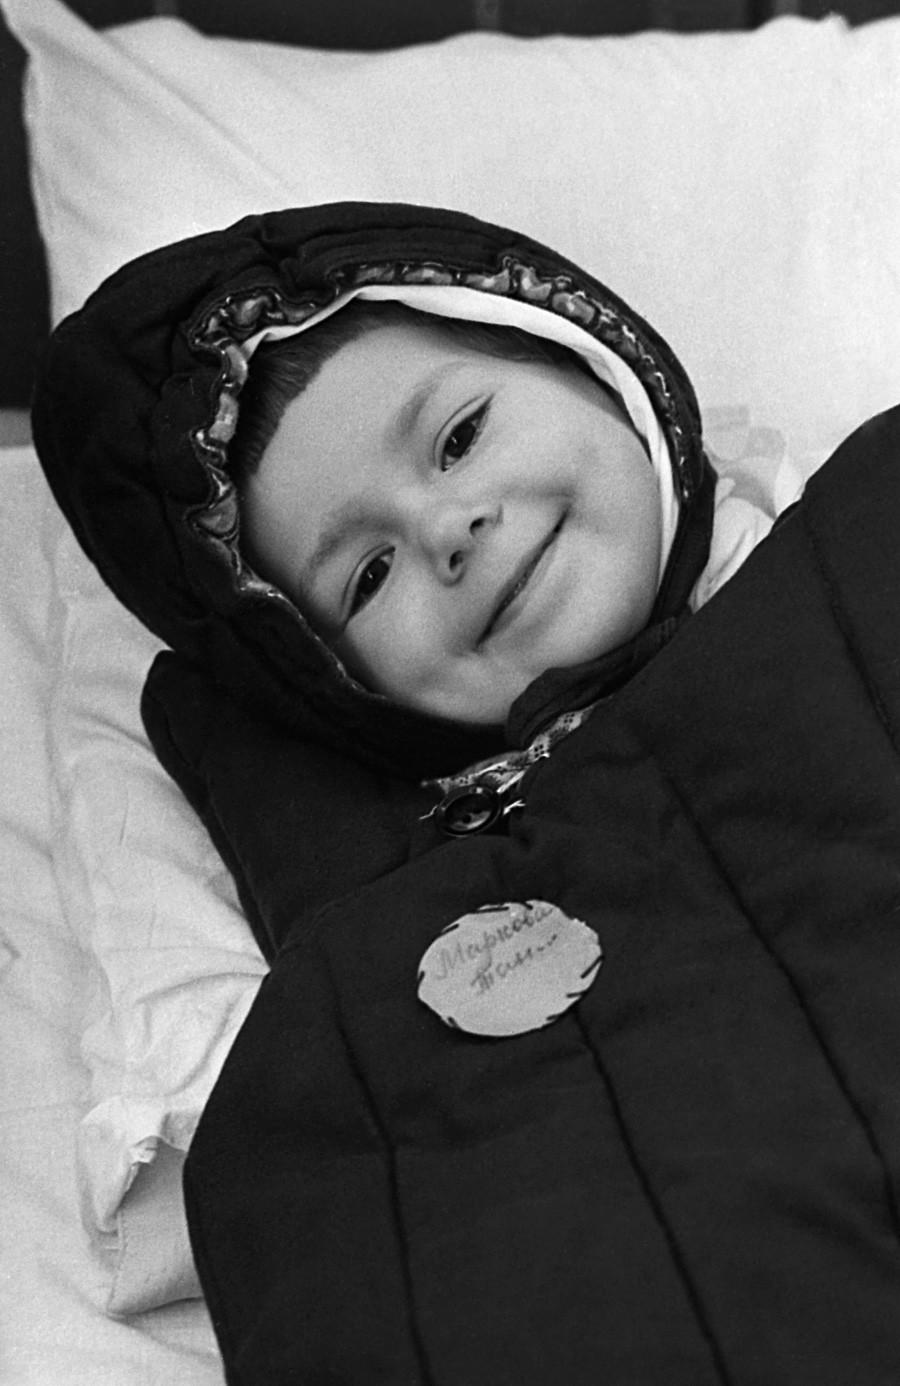 Seorang gadis kecil dalam kantong tidur di sebuah TK di Cherepovets, 1973.